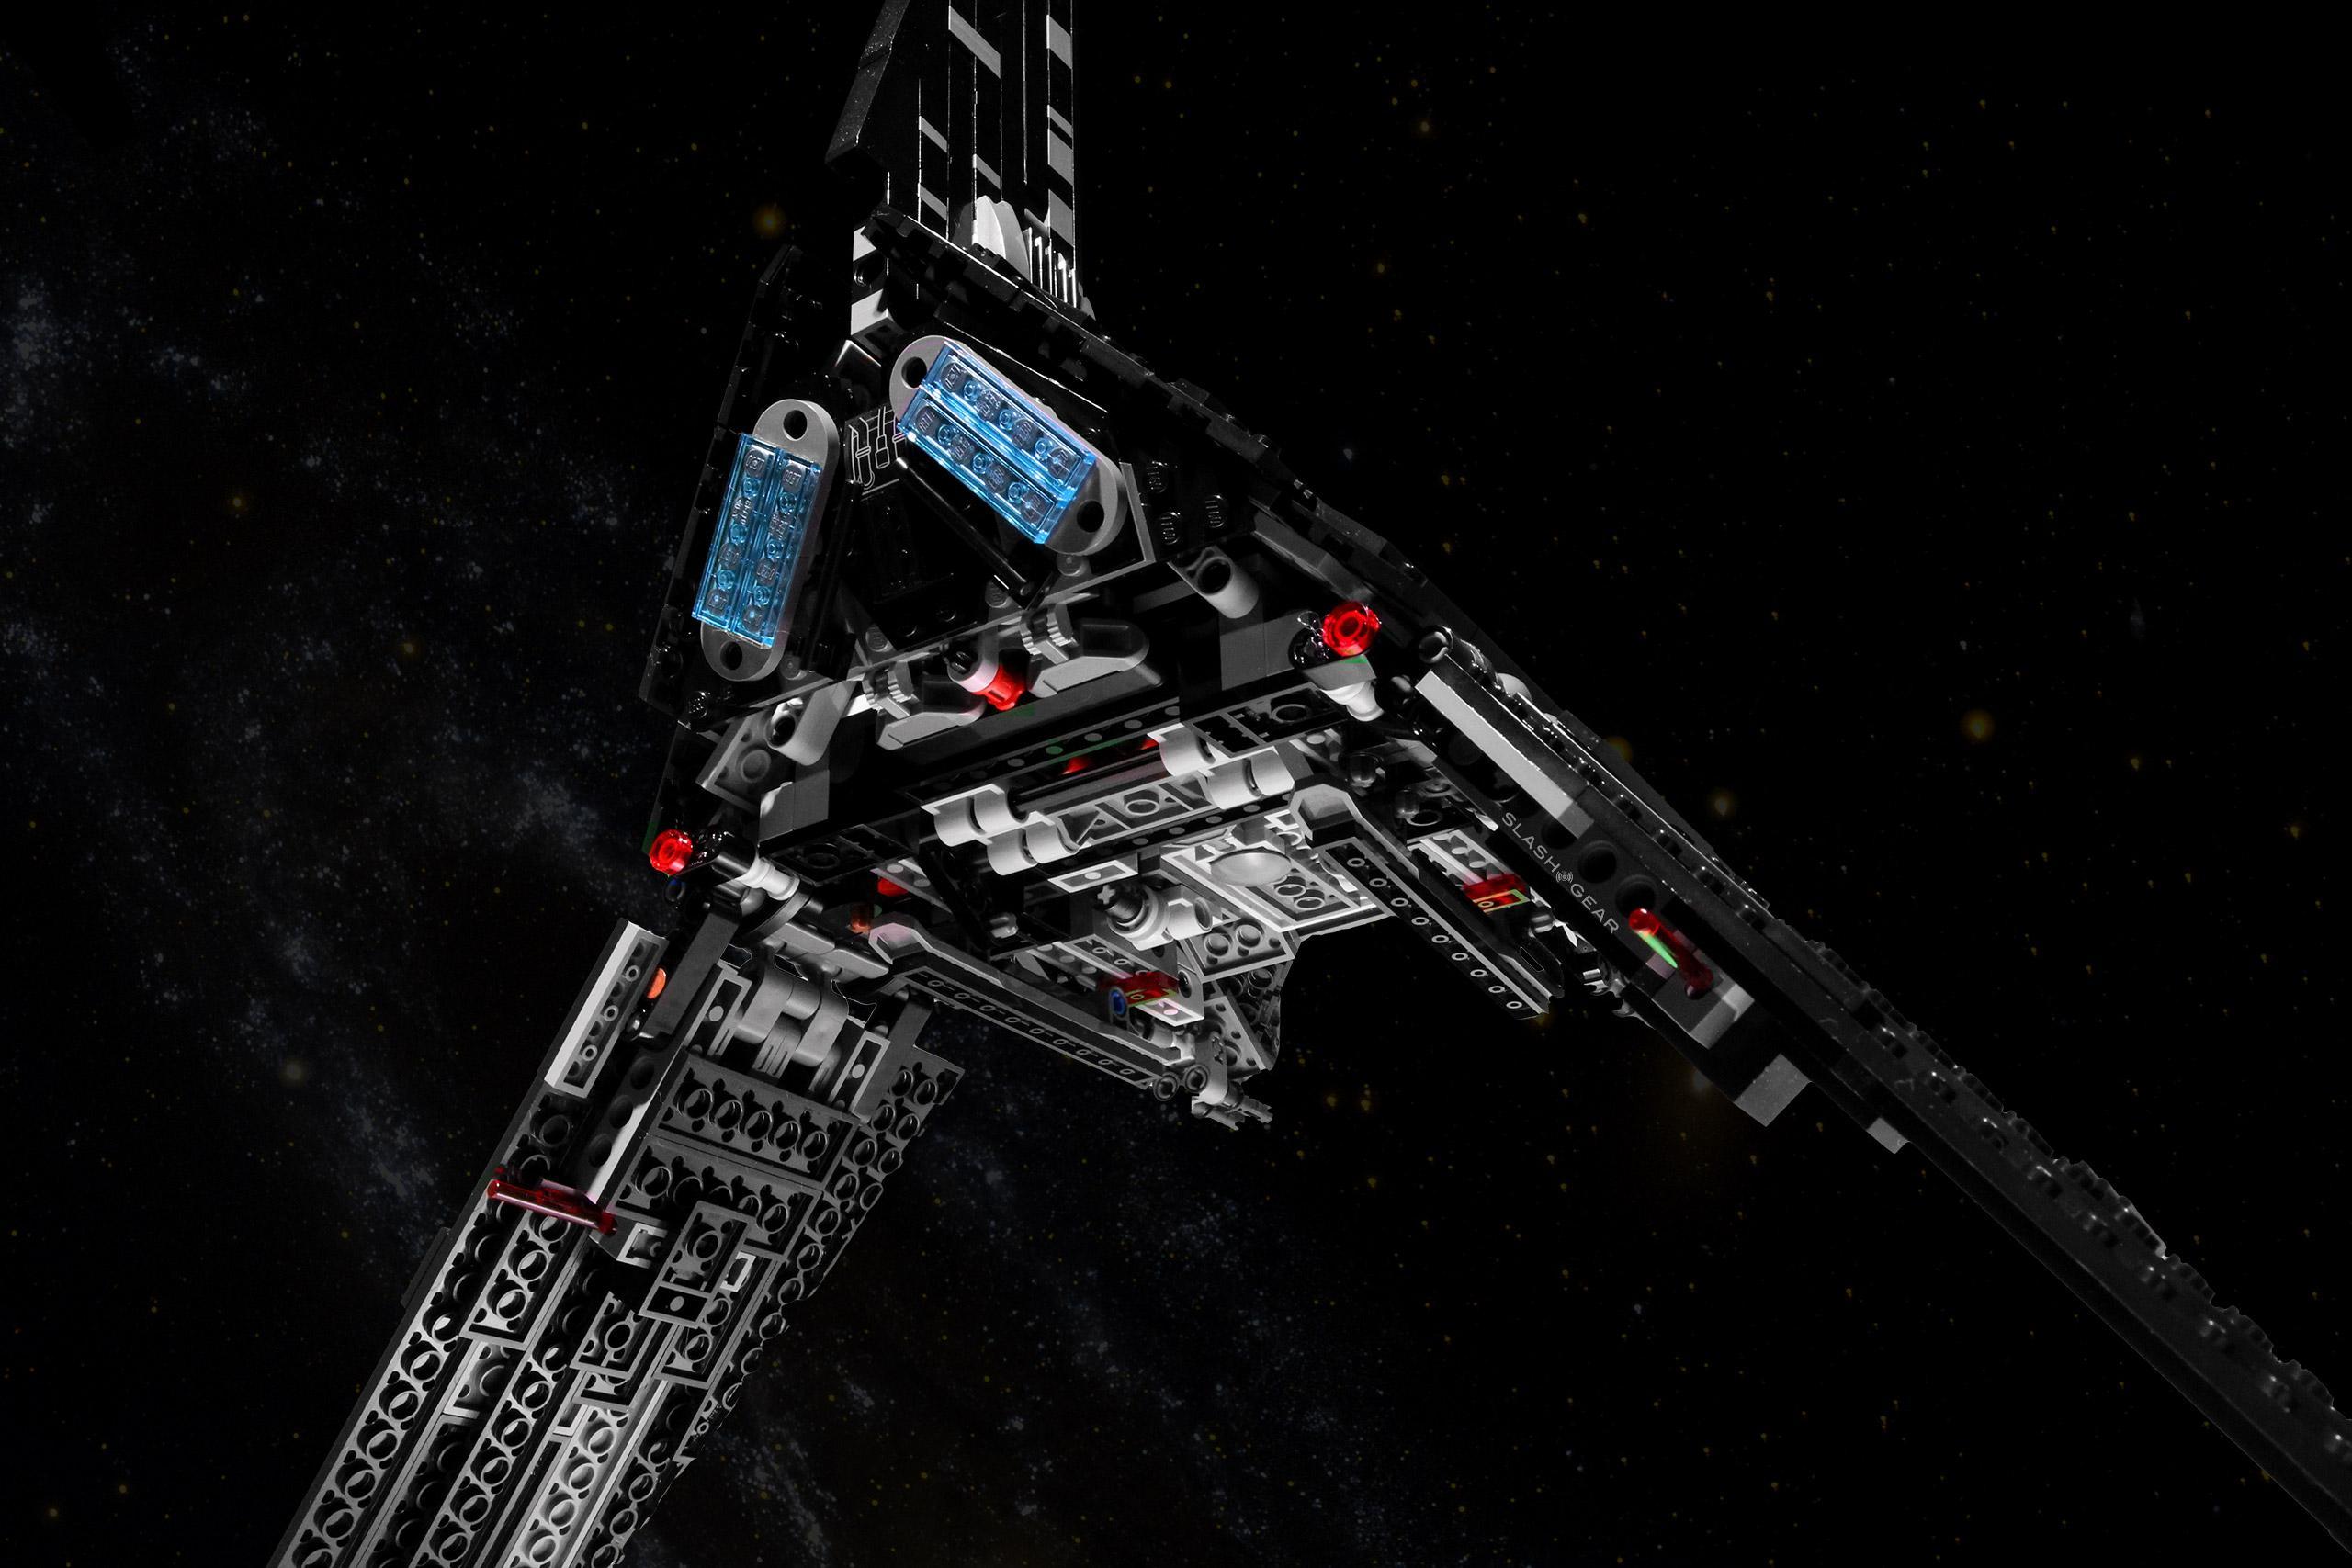 lego_shuttle_flight